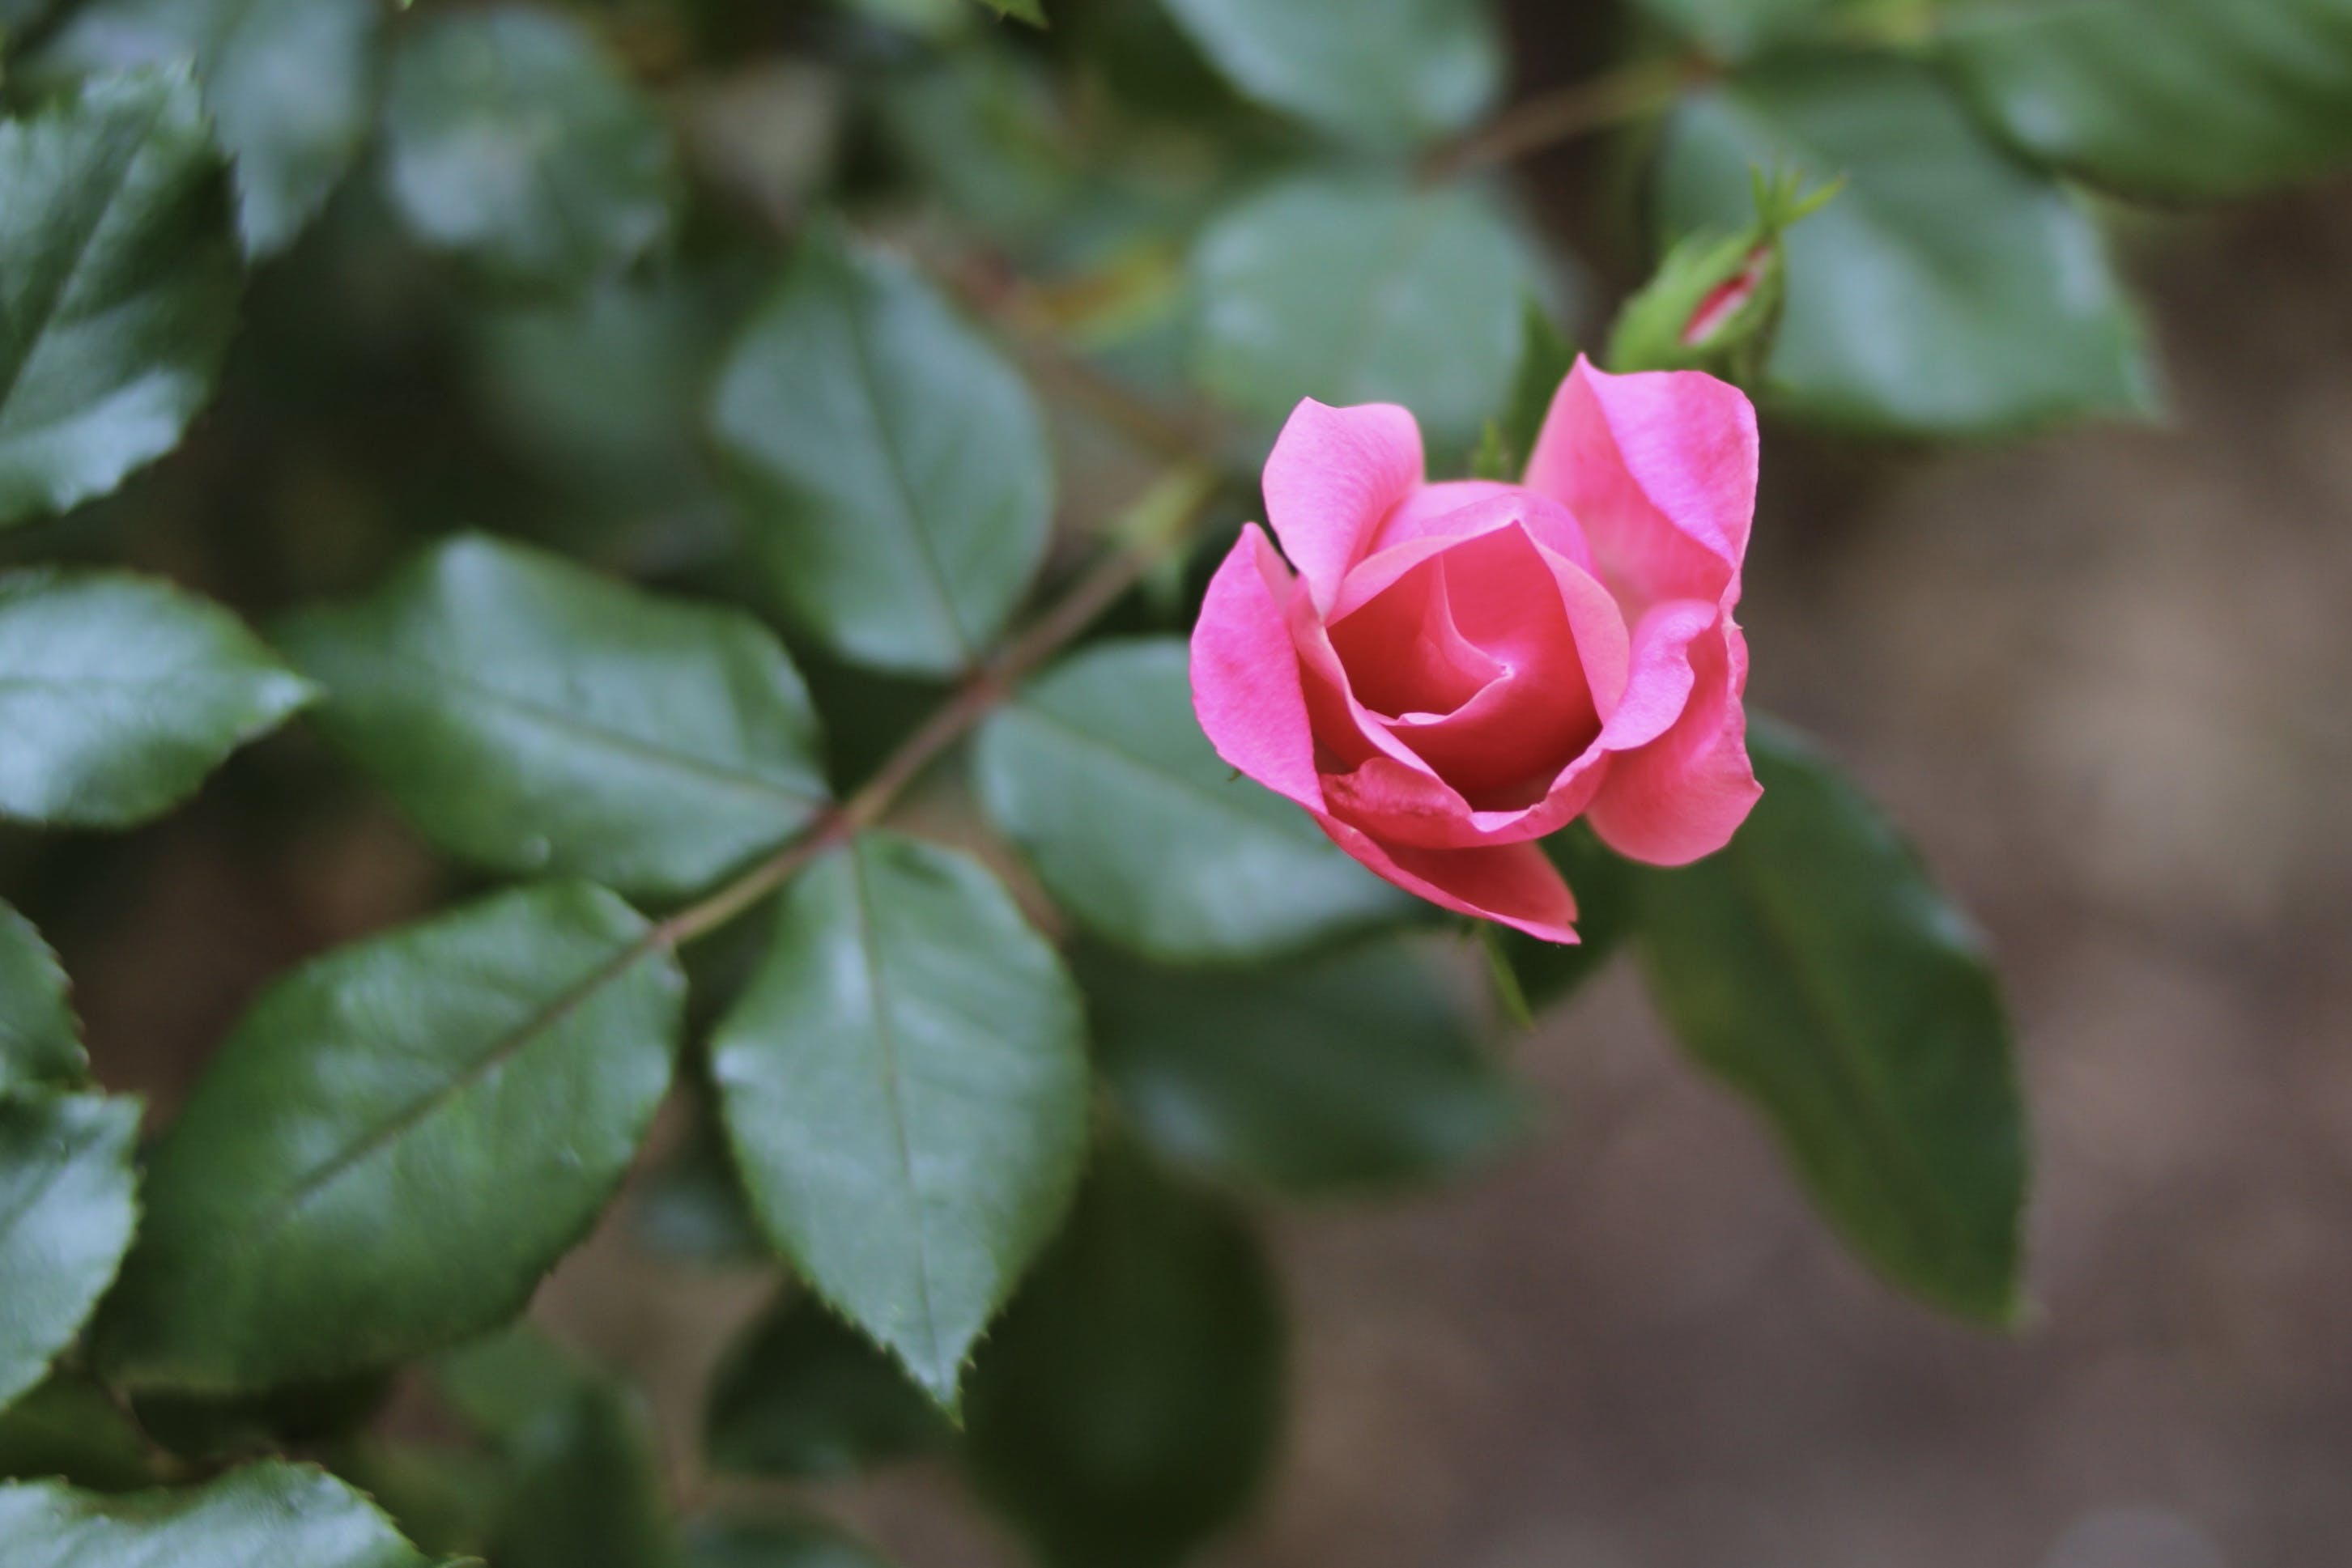 Gratis stockfoto met roos, Roze roos, roze roosknop, rozenknop